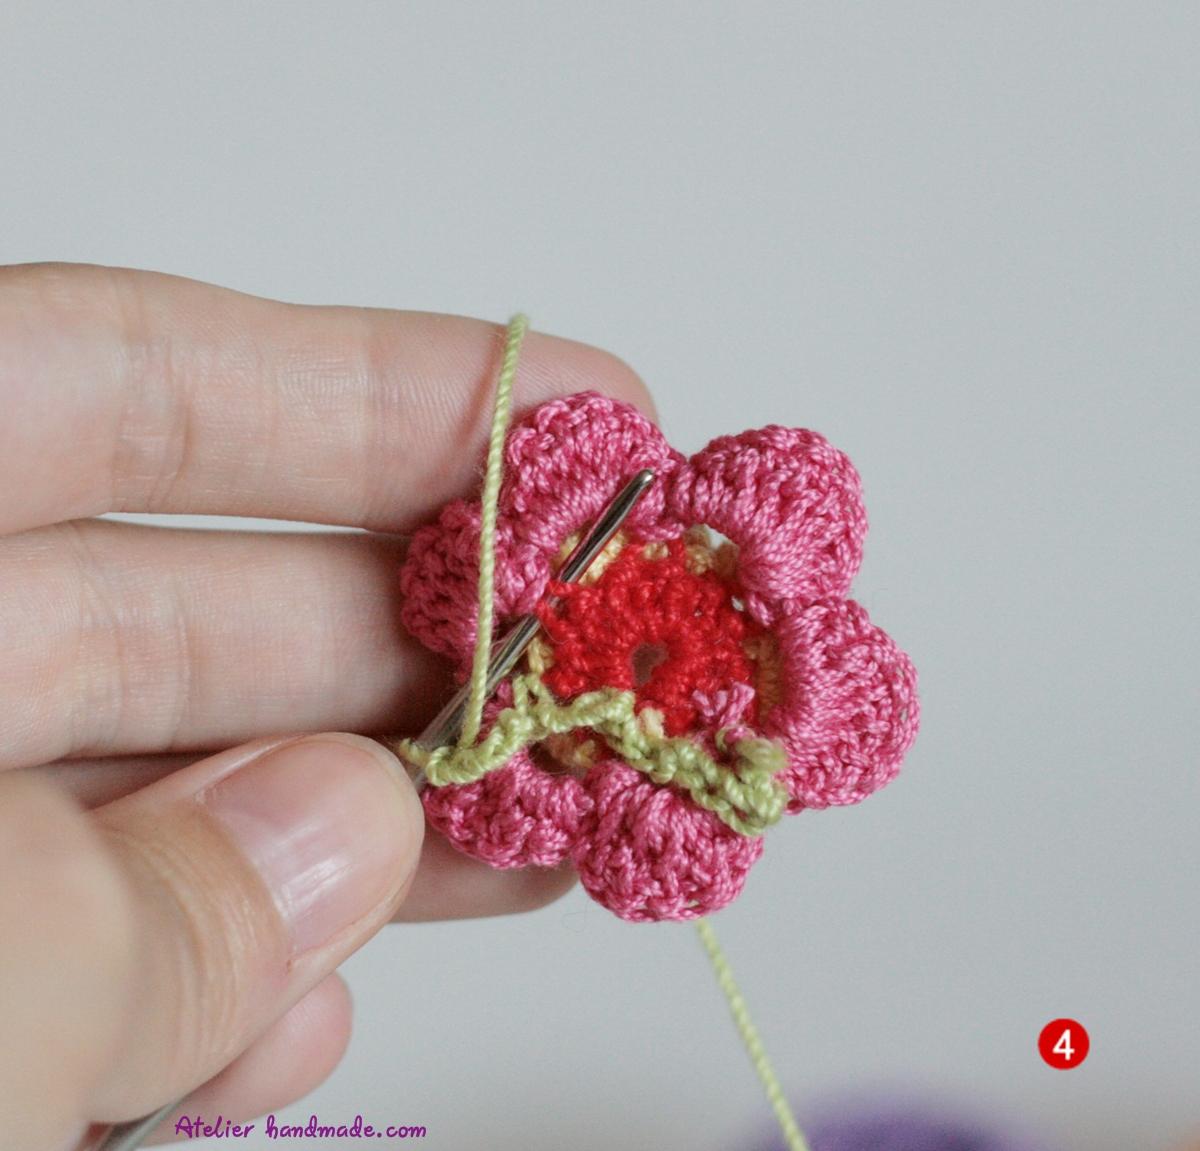 cum sa crosetezi o floare in multe culori